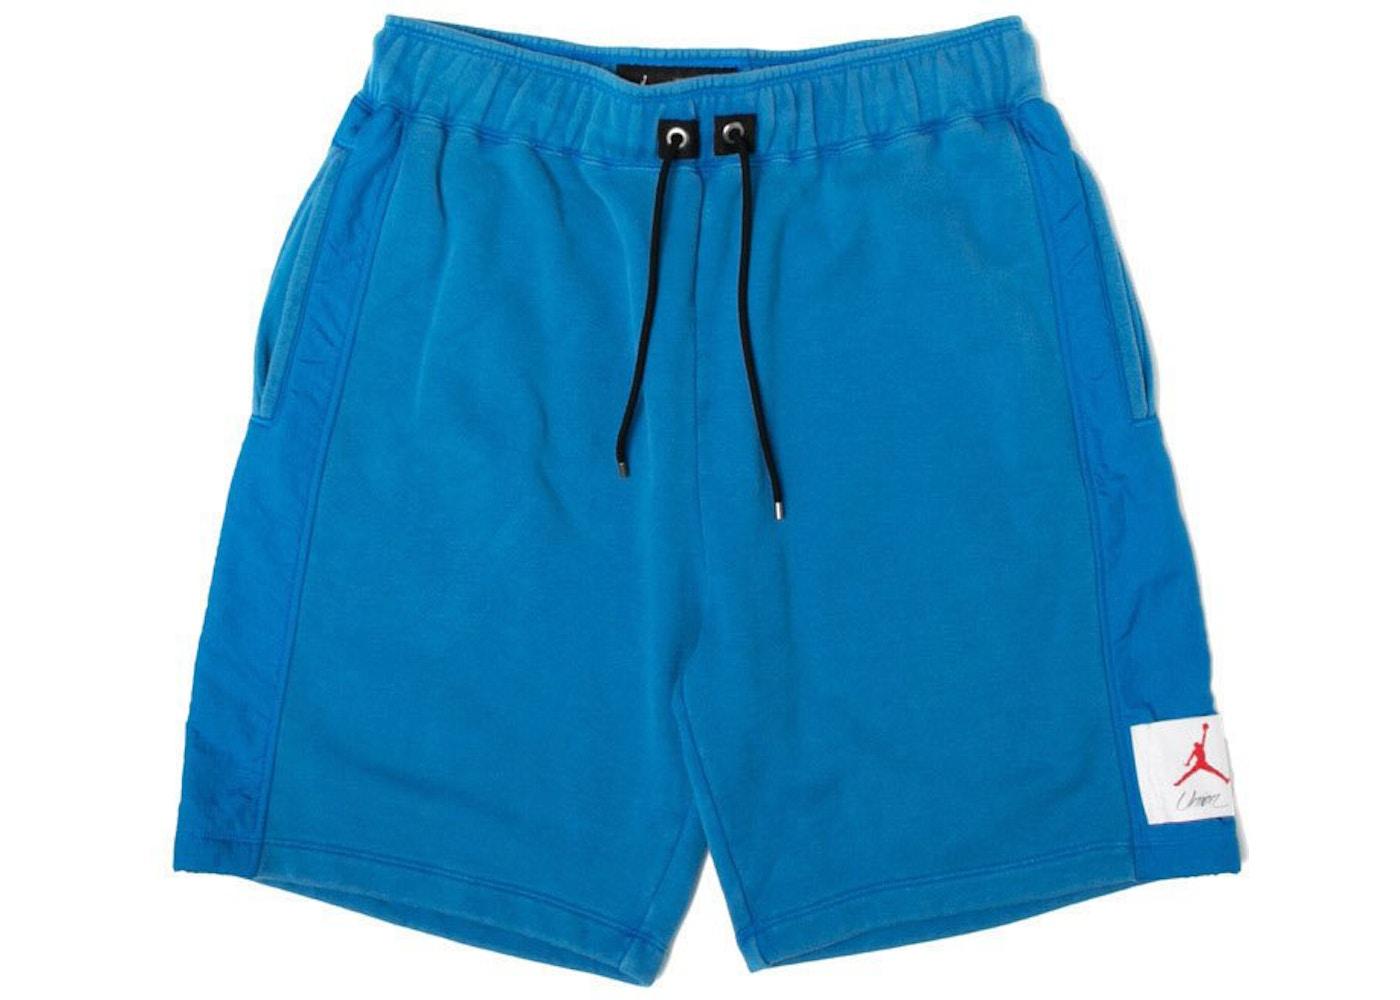 4d37061f950c Jordan x Union NRG Vault AJ Flight Shorts Blue - FW18